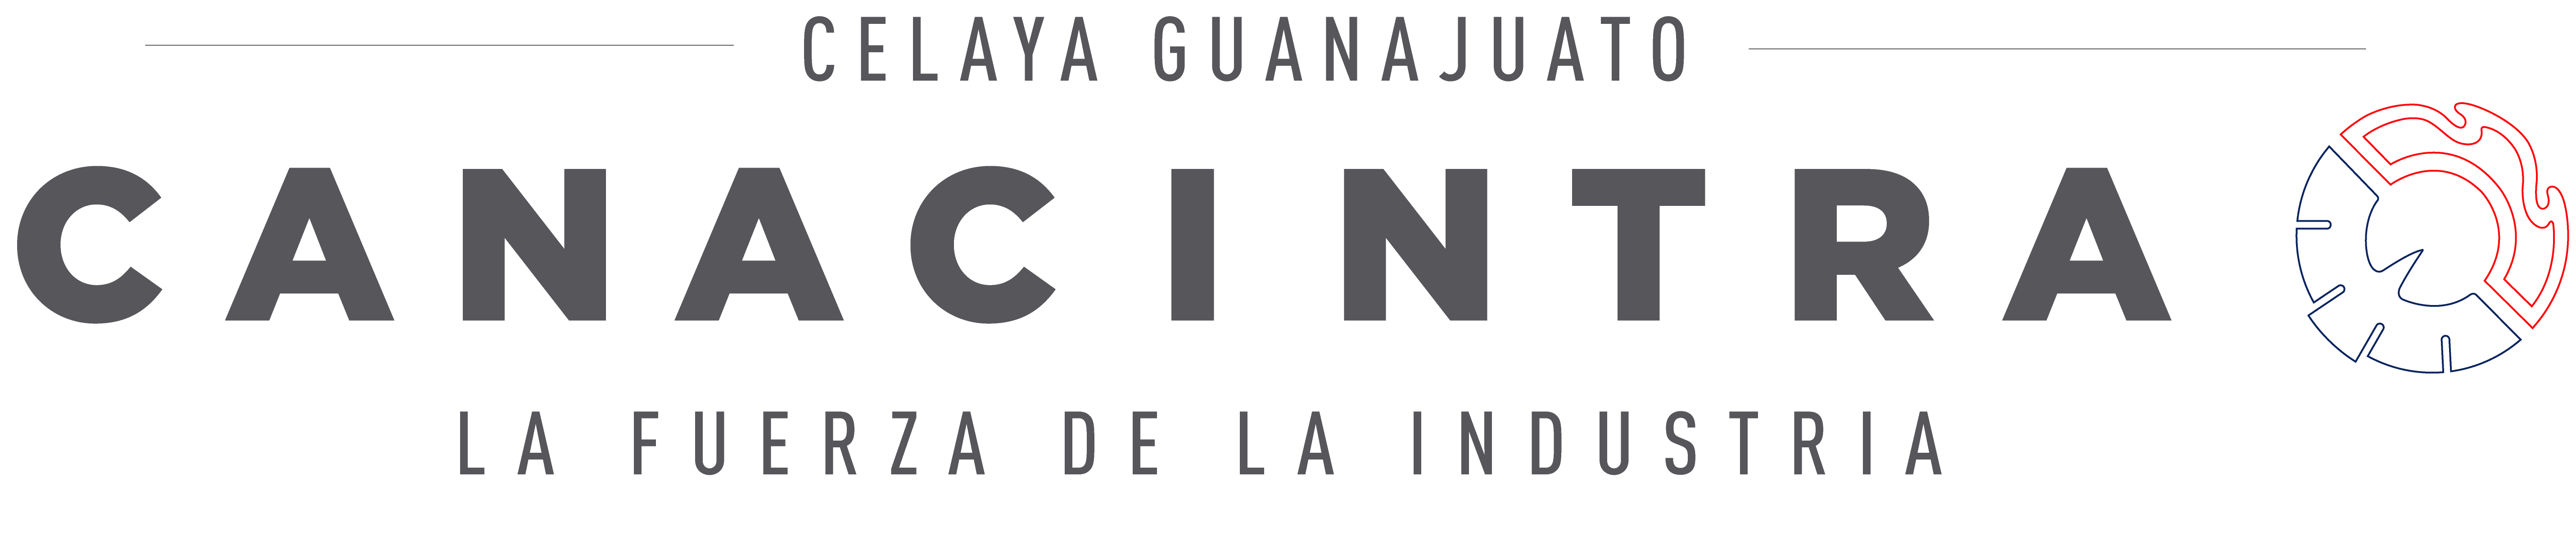 Canacintra Celaya